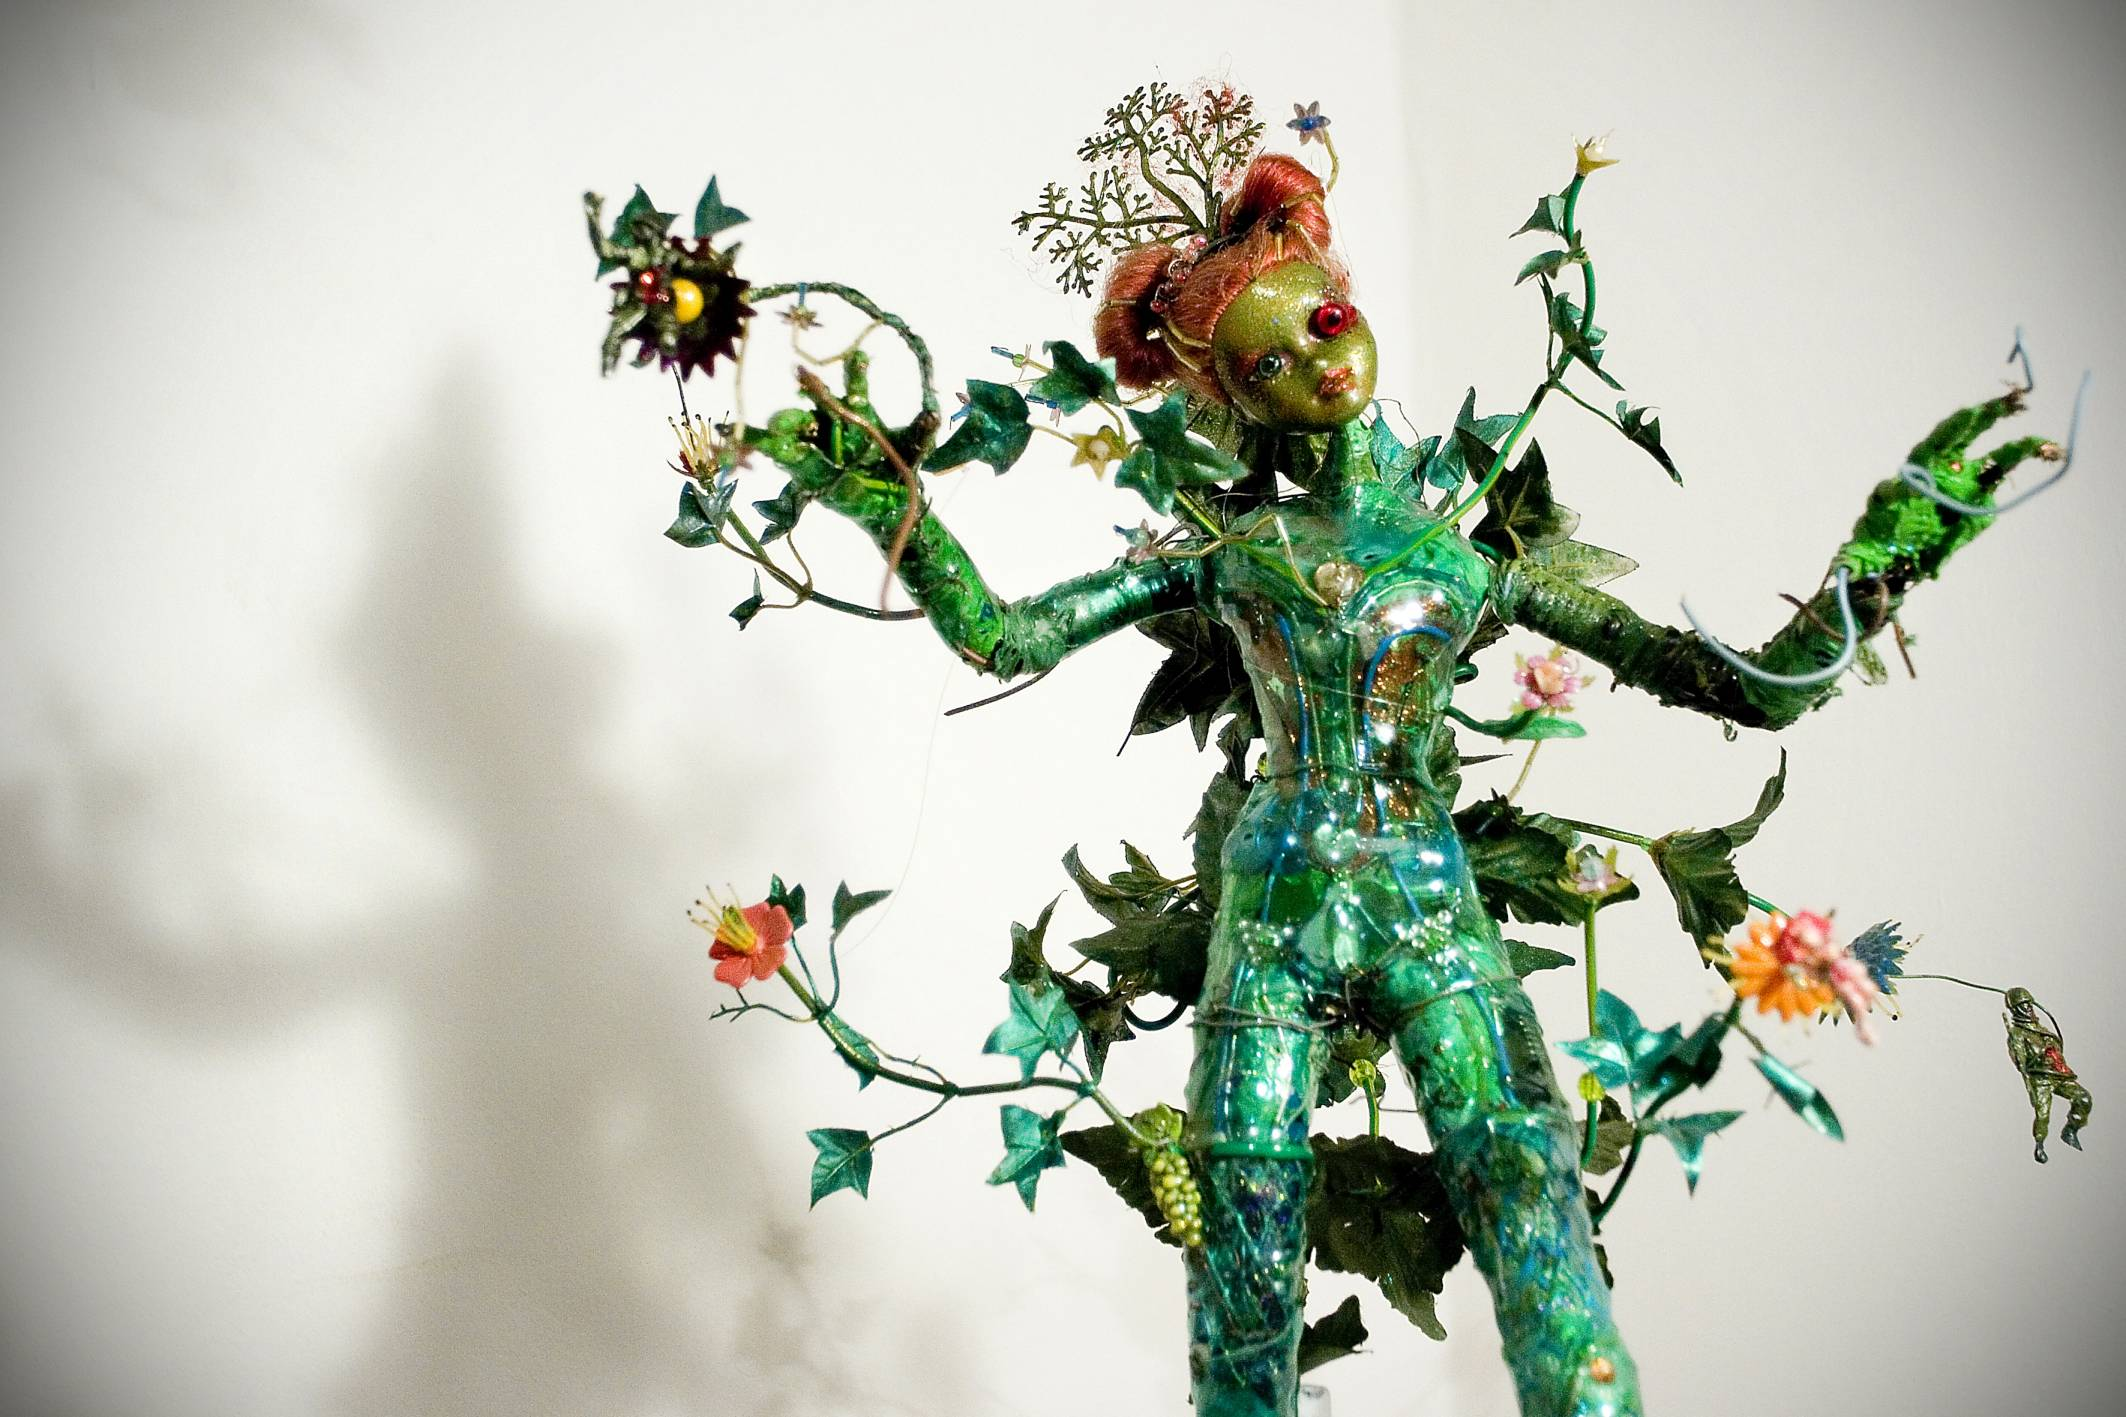 vermin (2010) - Juan Miceli